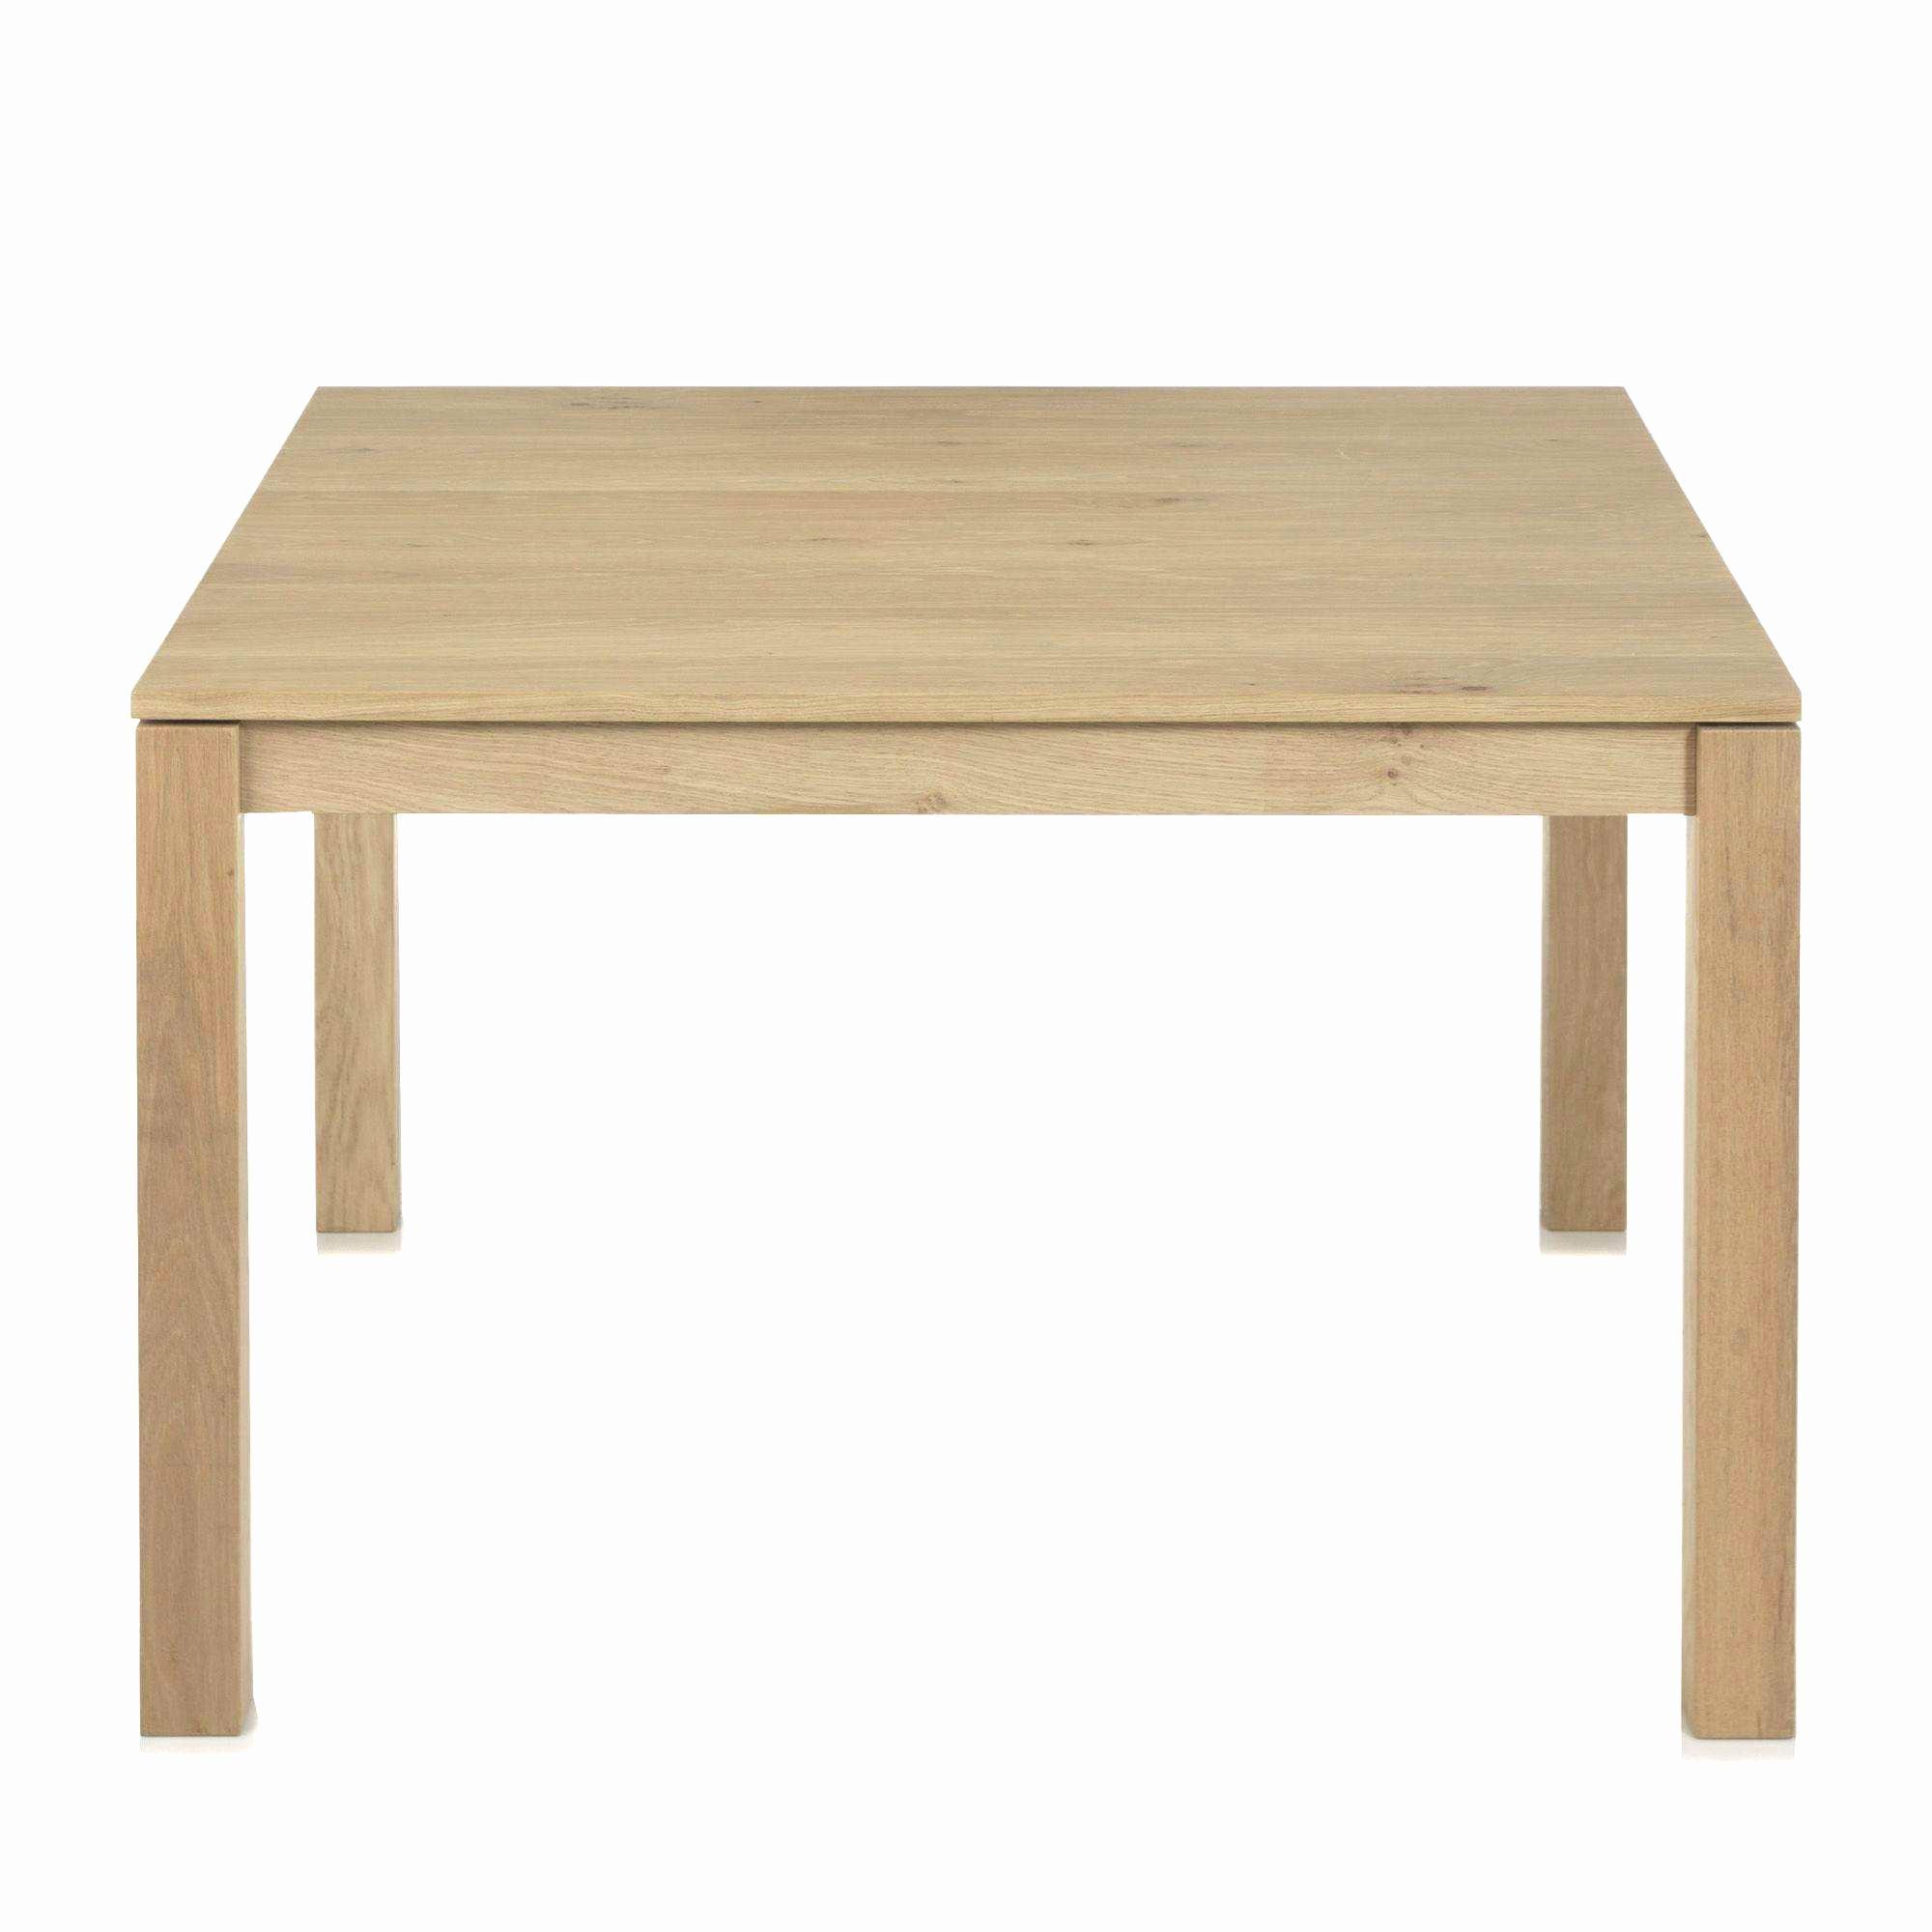 table de massage pliante charmant table pliante jardin table de jardin design pas cher table cuisine of table de massage pliante 1